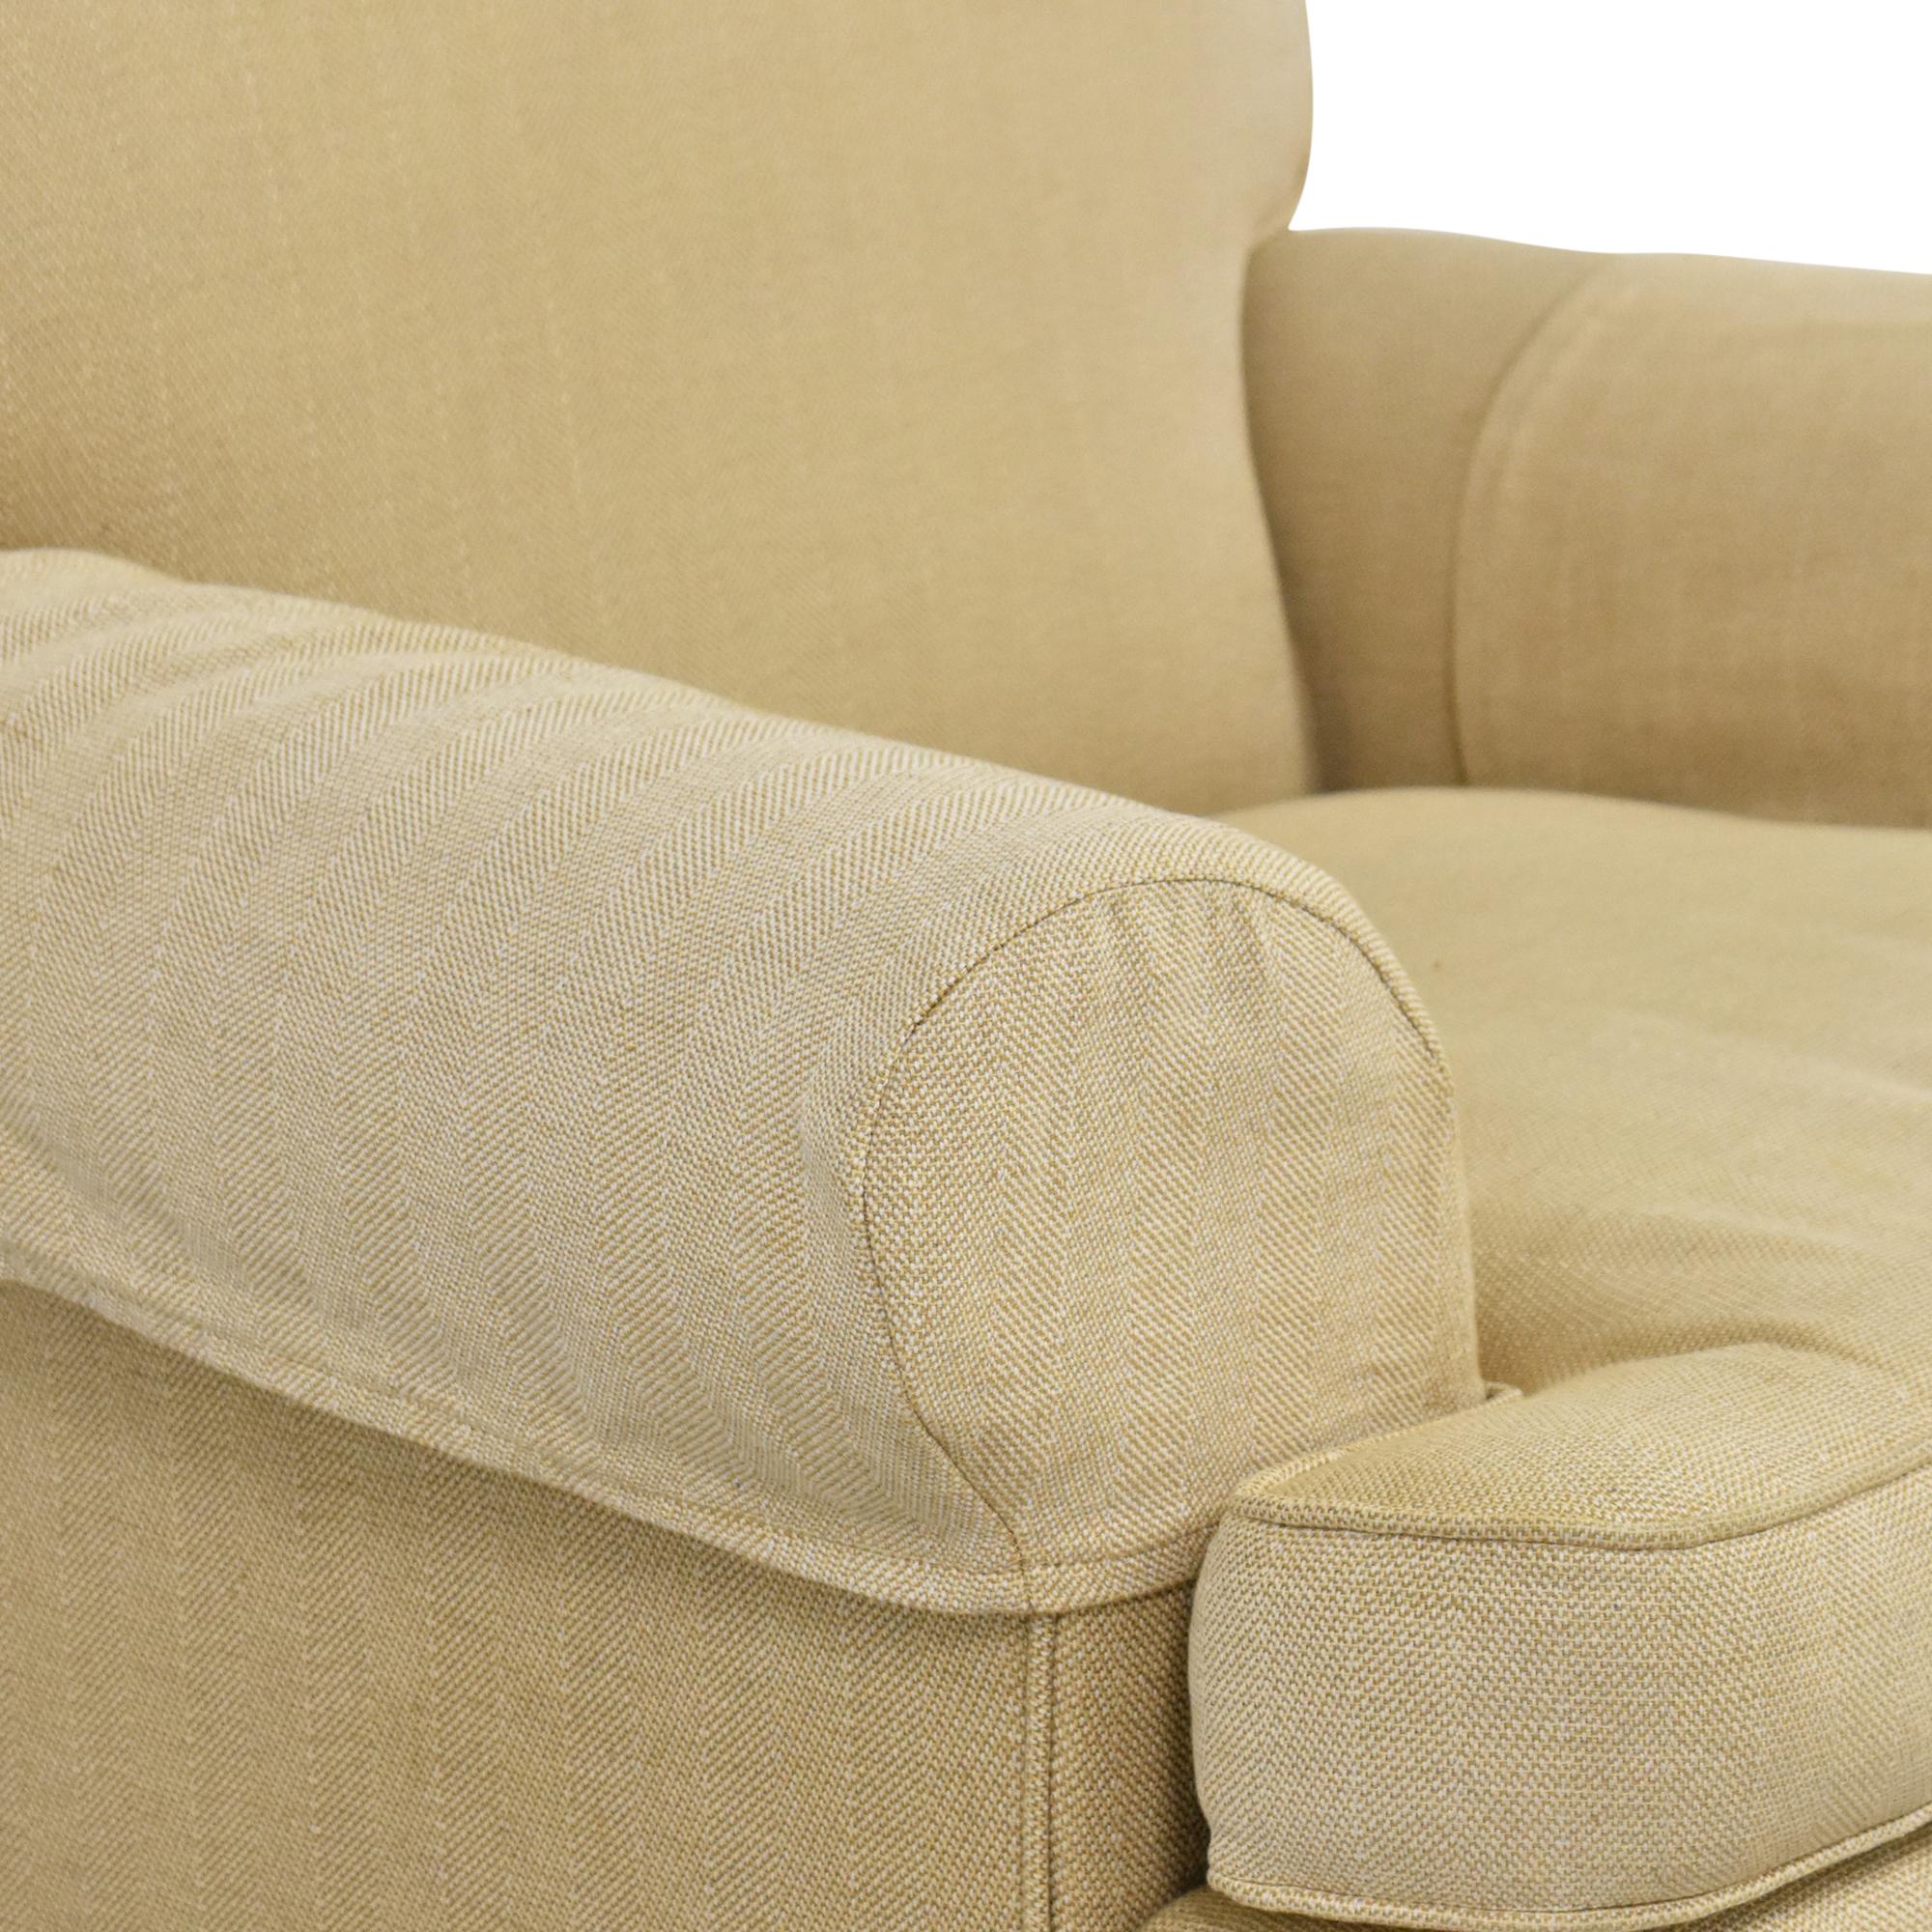 Ralph Lauren Home Ralph Lauren Home Accent Chair discount